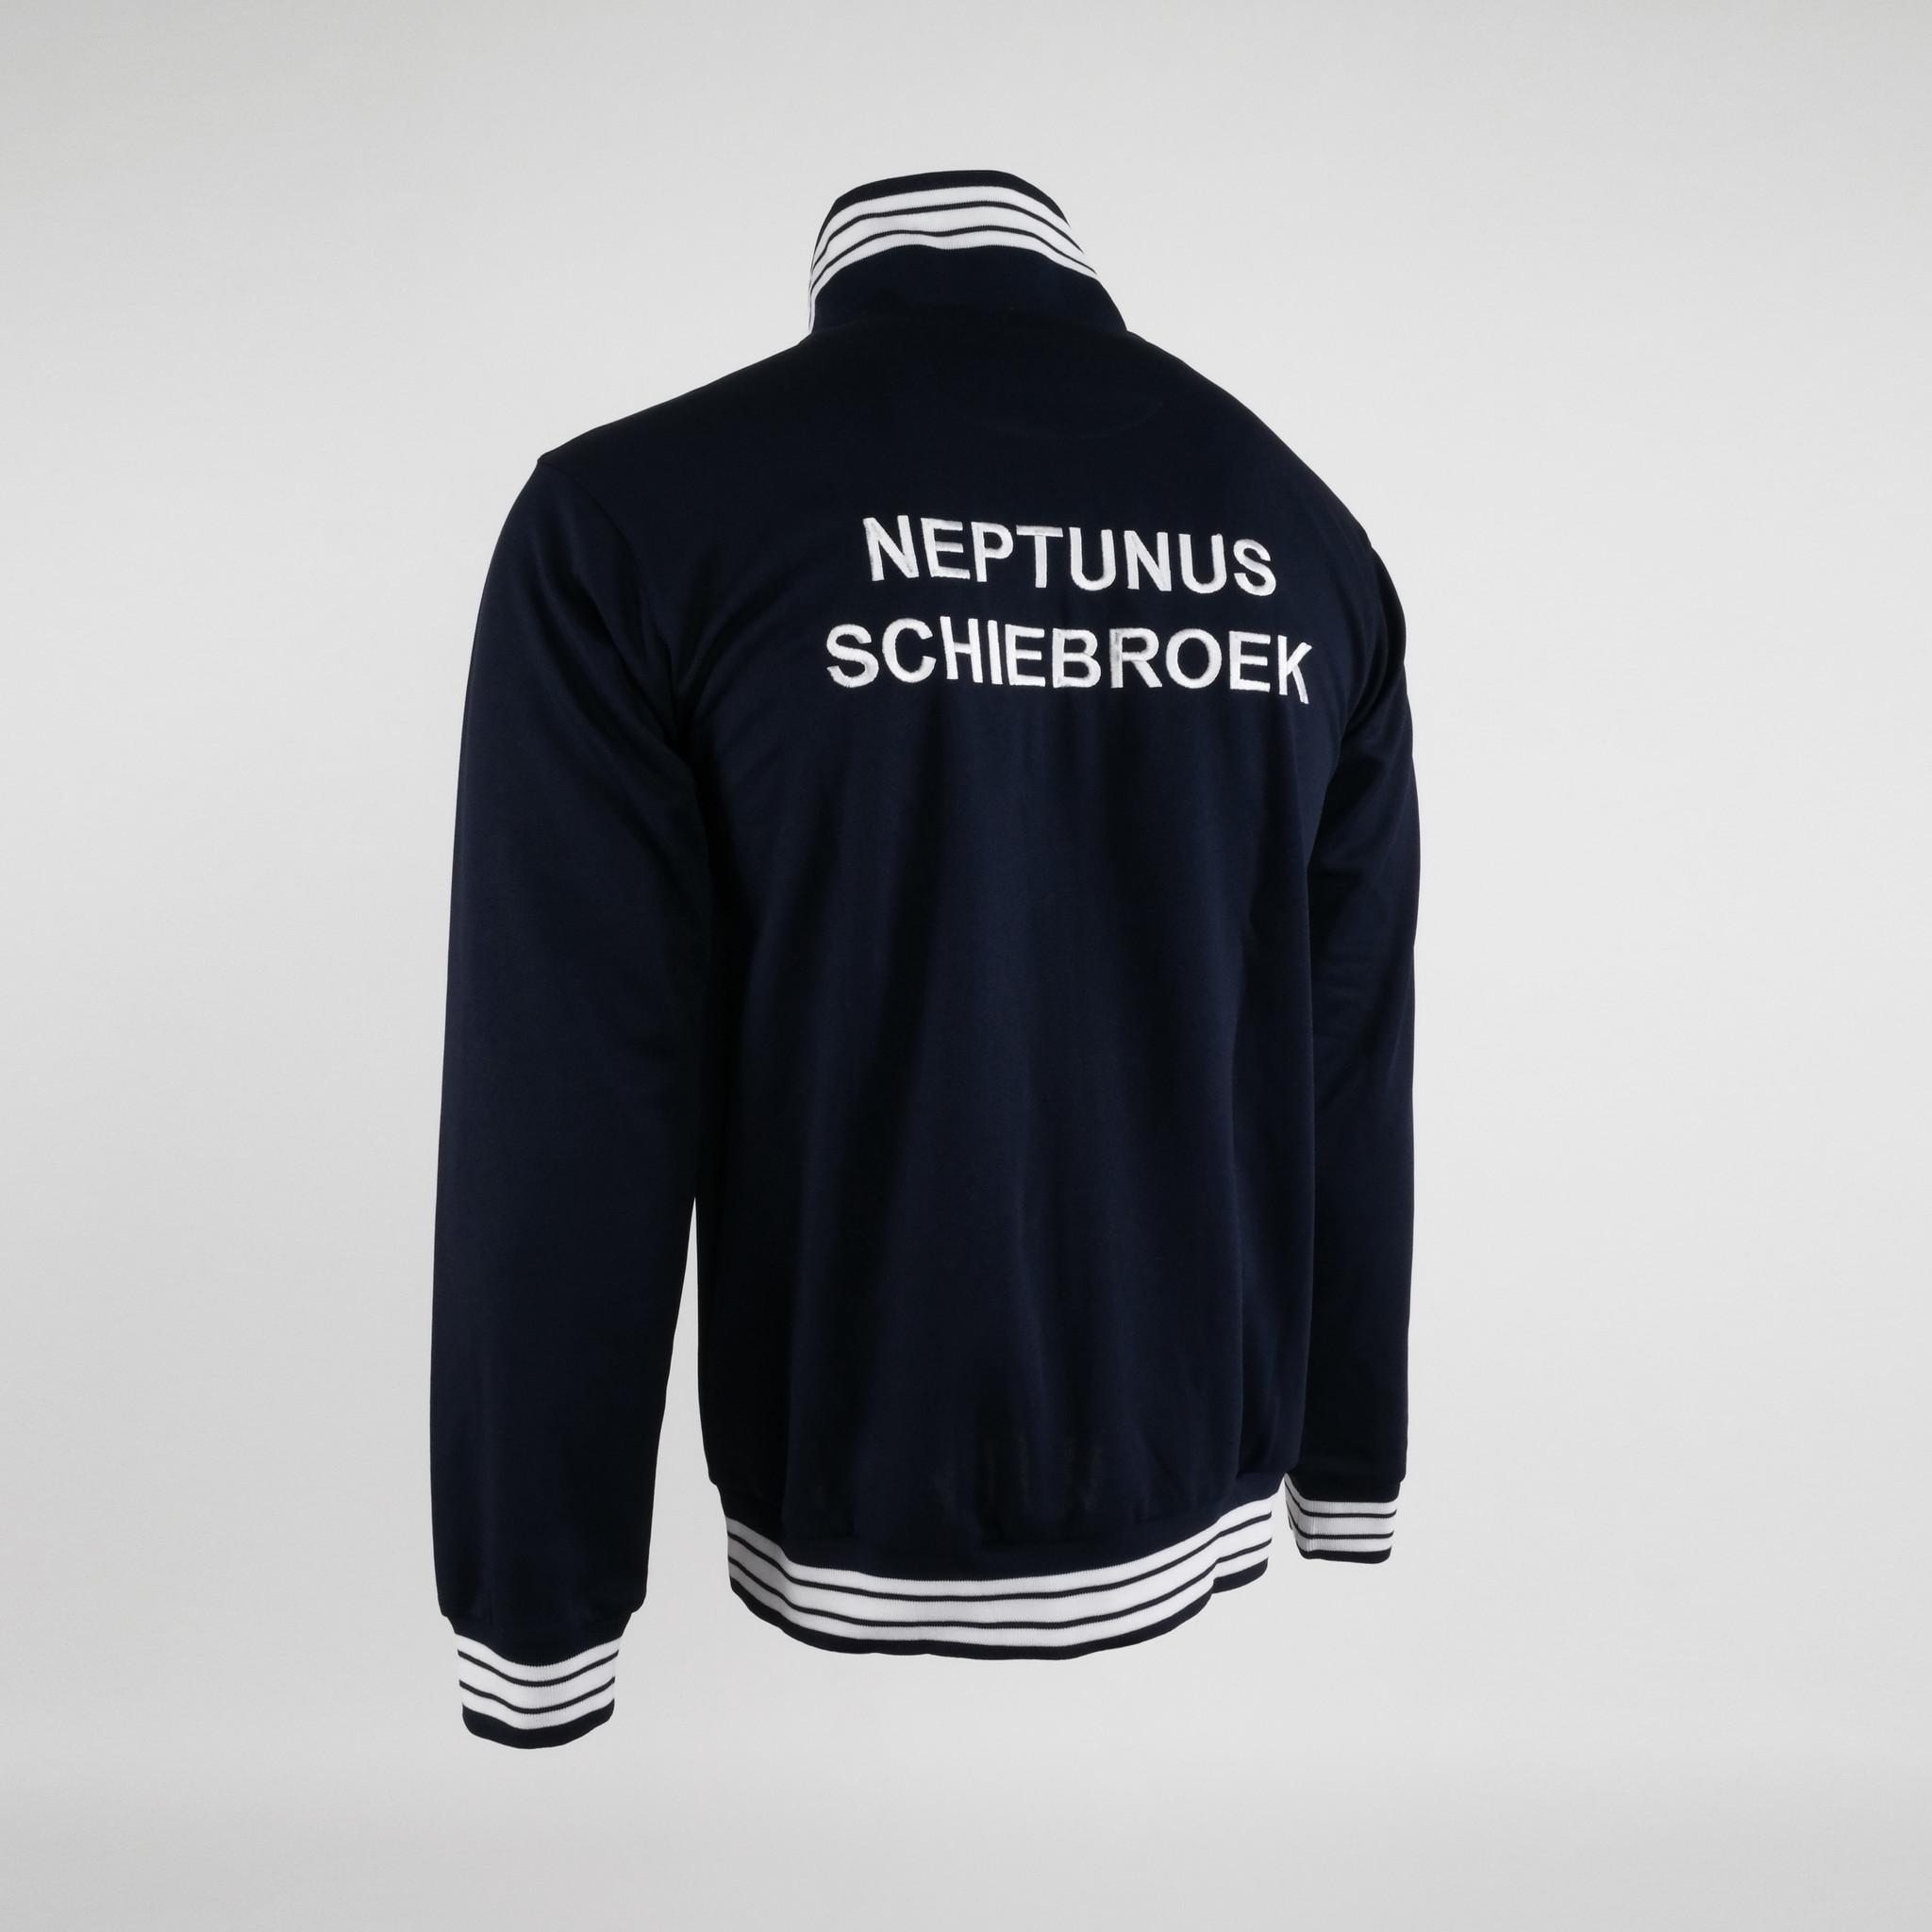 Klupp MAAT Neptunus retrojack, Navy